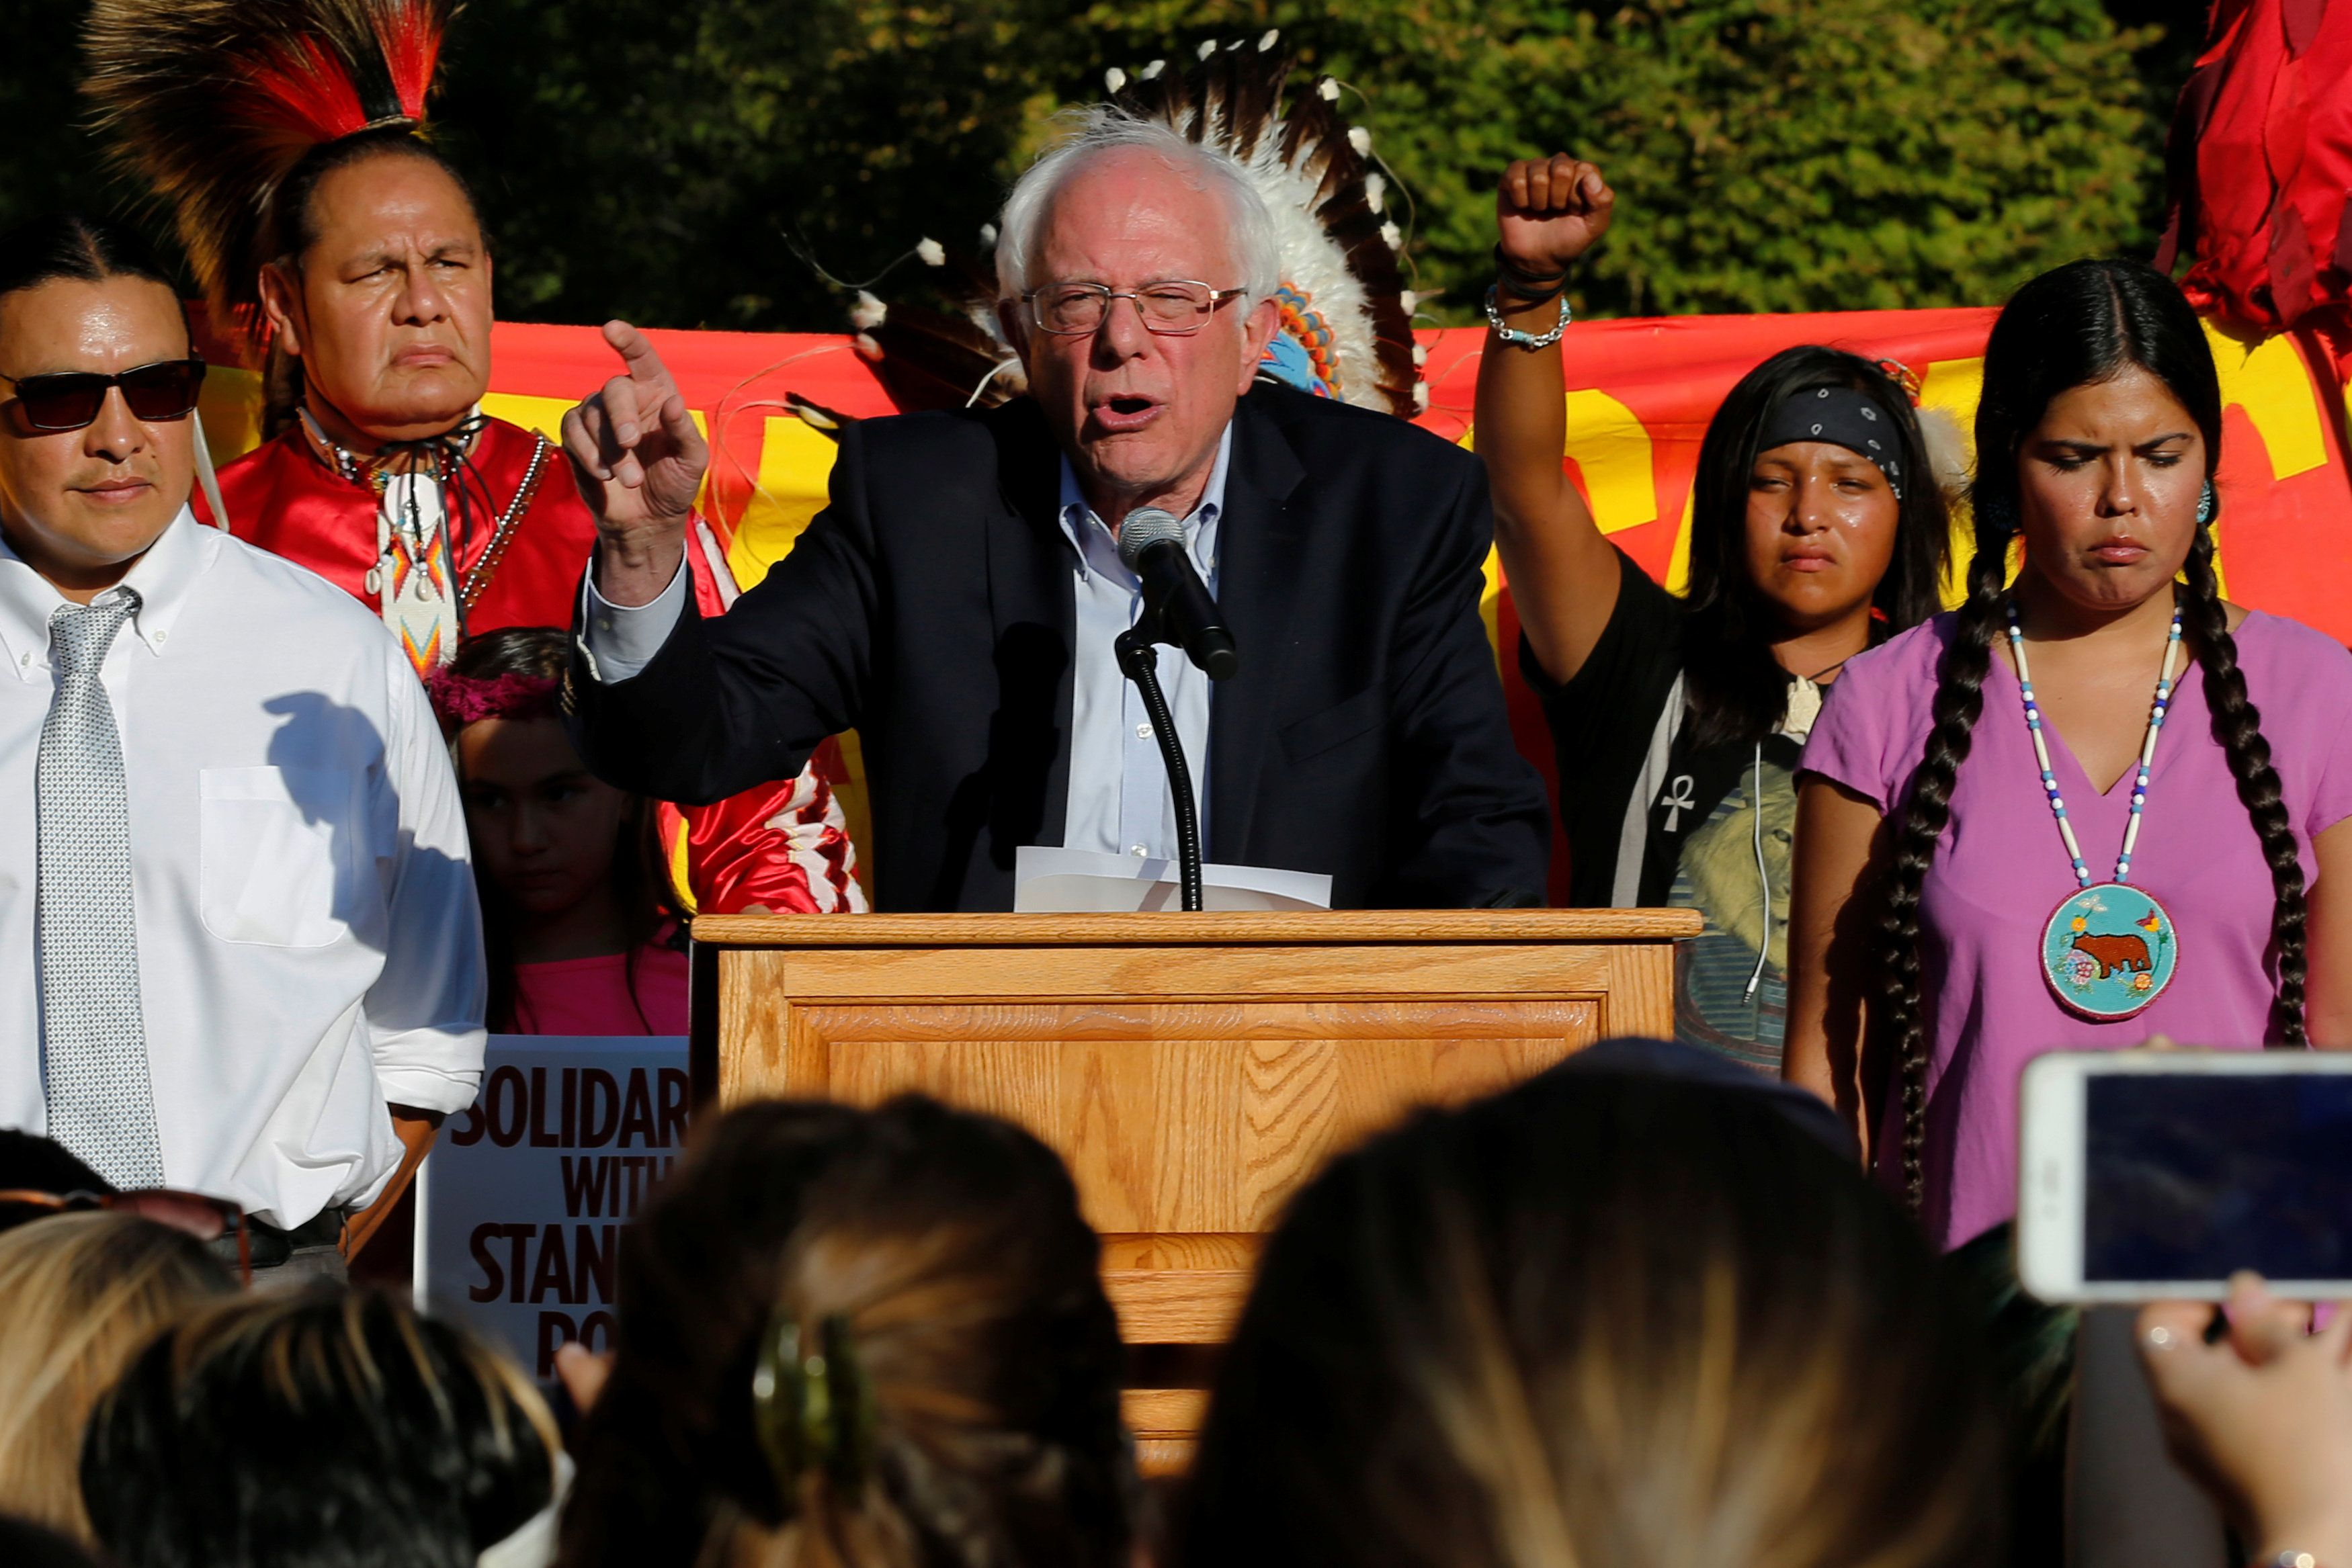 Sen. Bernie Sanders (I-Vt.)speaks at a rally to stop the Dakota Access Pipeline on Sep. 13, 2016.